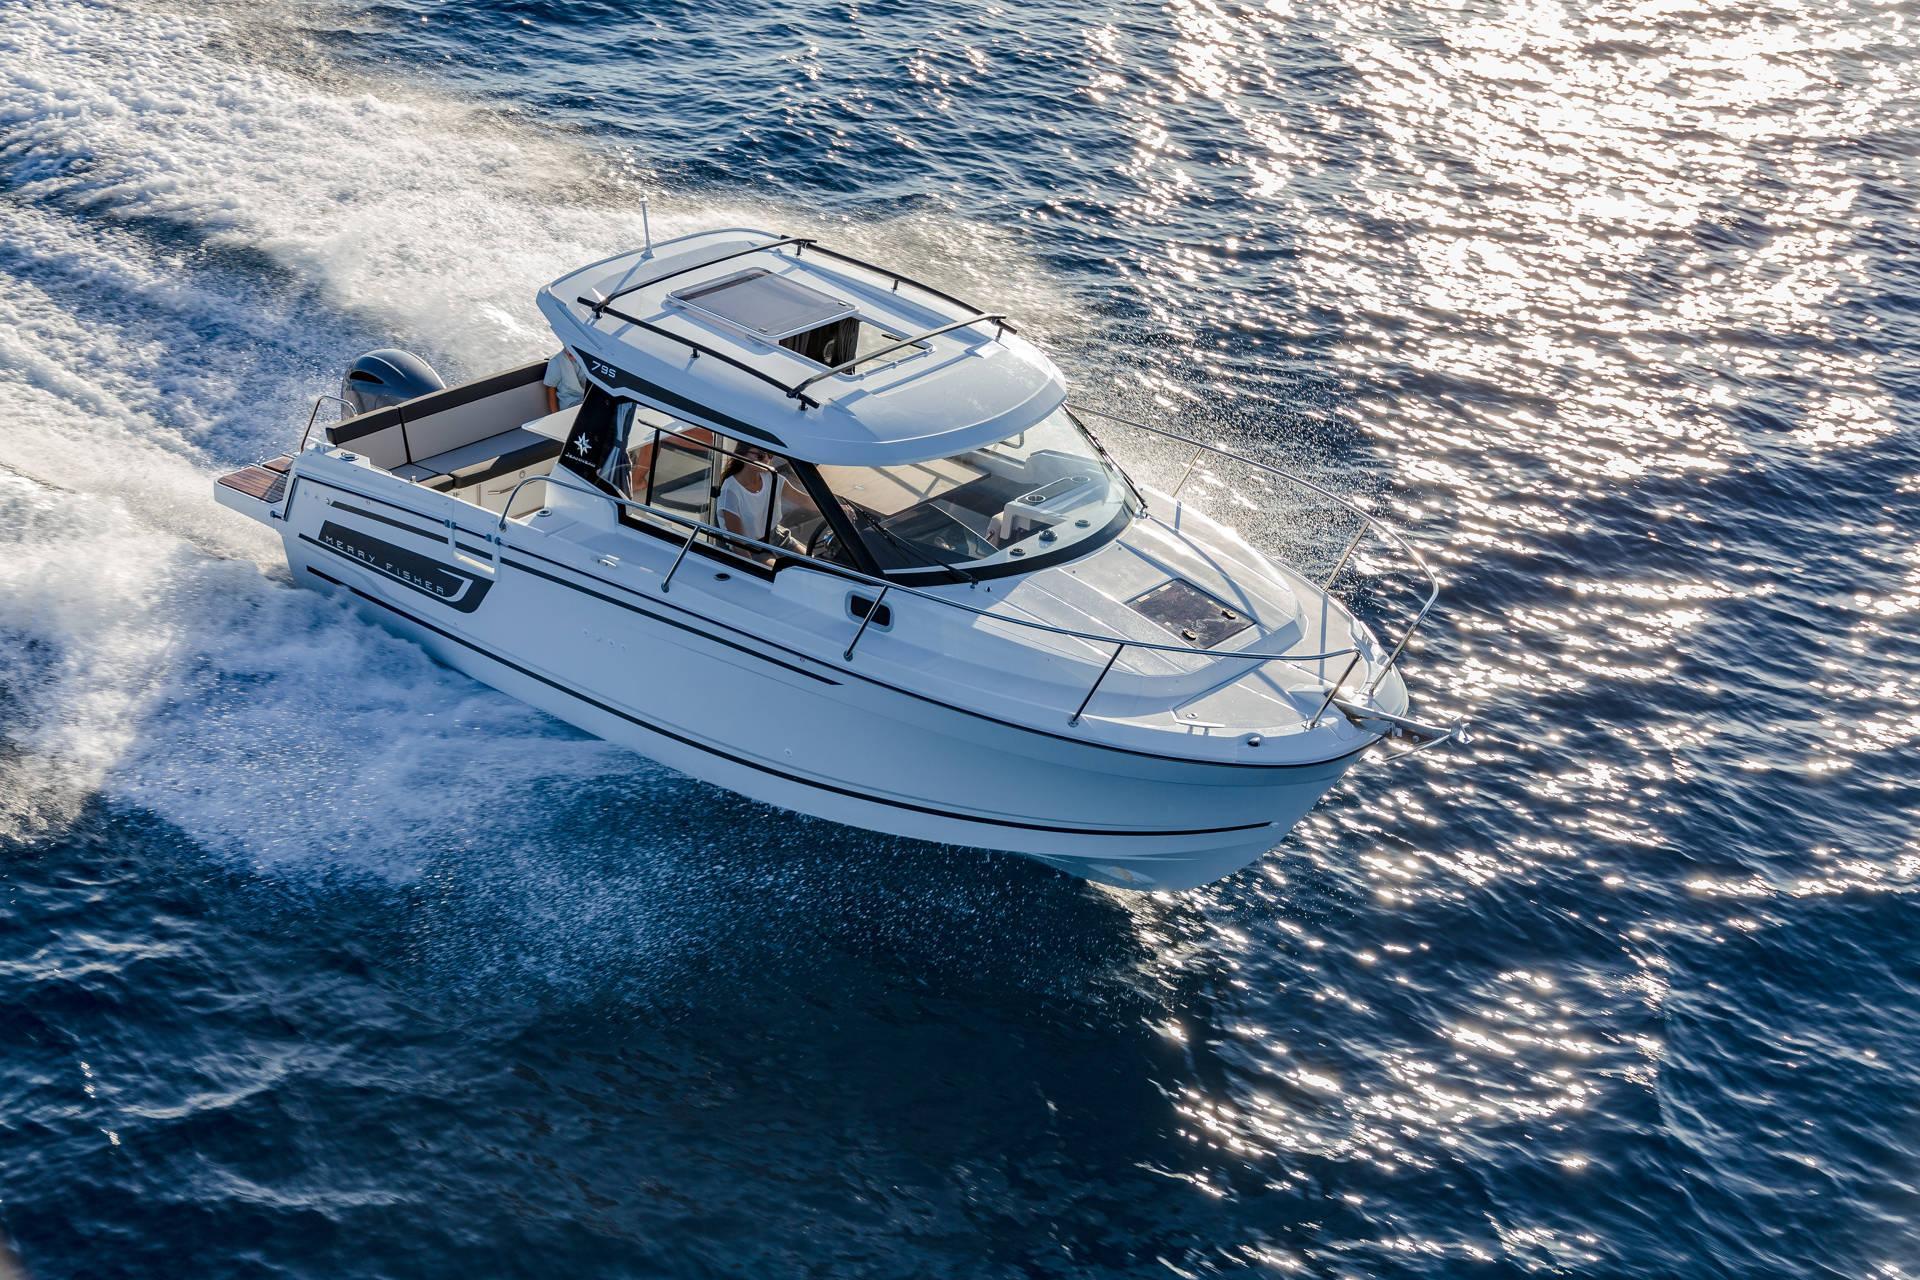 merry-fisher-795-serie2-bateau-moteur-in-board-Jeanneau-bateau-a-Marseille-yatch-mediterranee-8